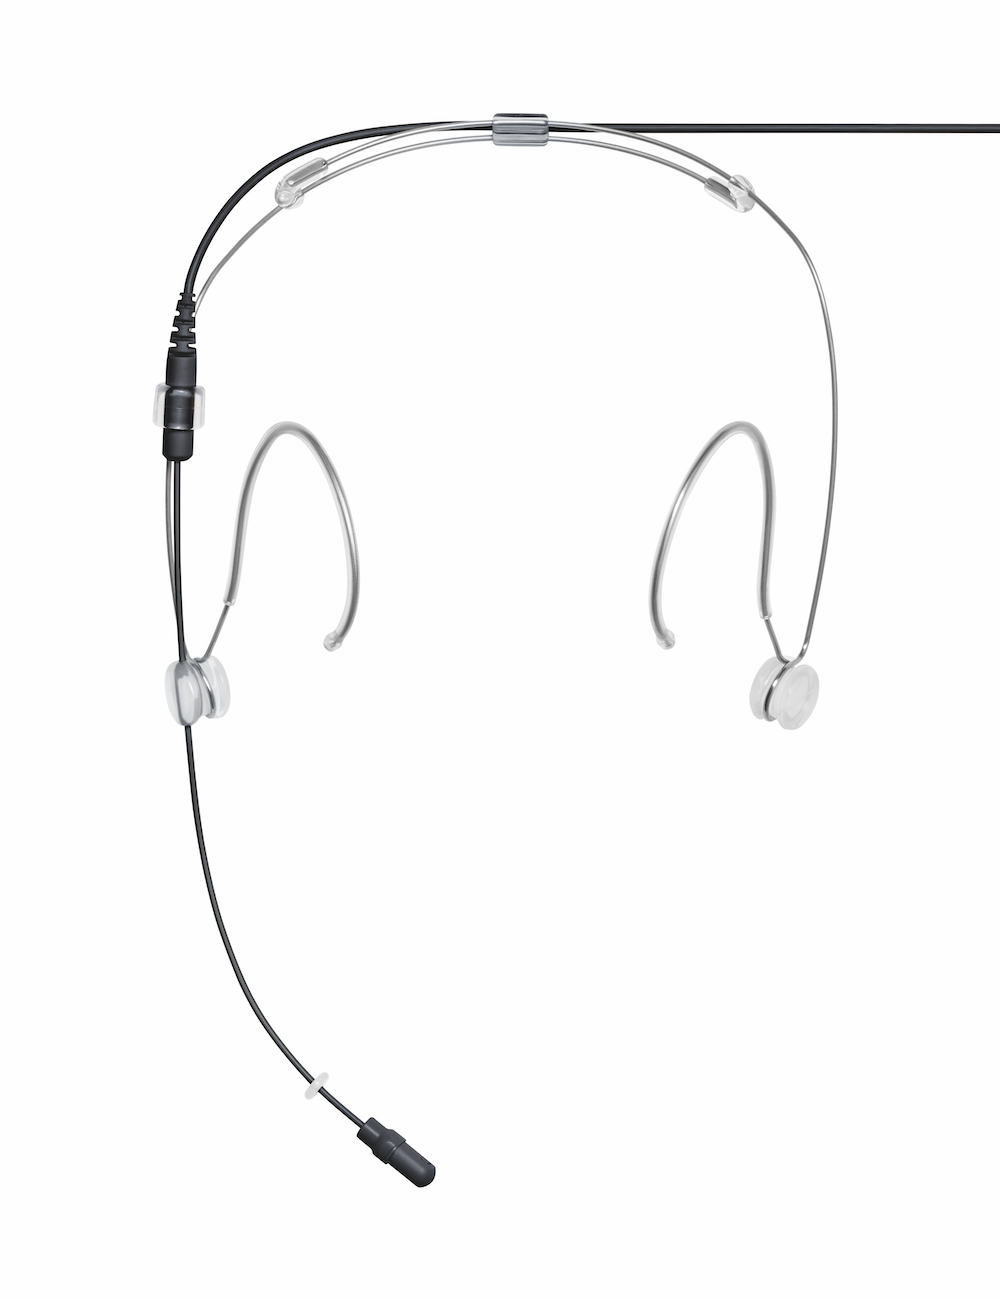 DH5B_Headset_Omni_Black_Straight-Top-Down.png